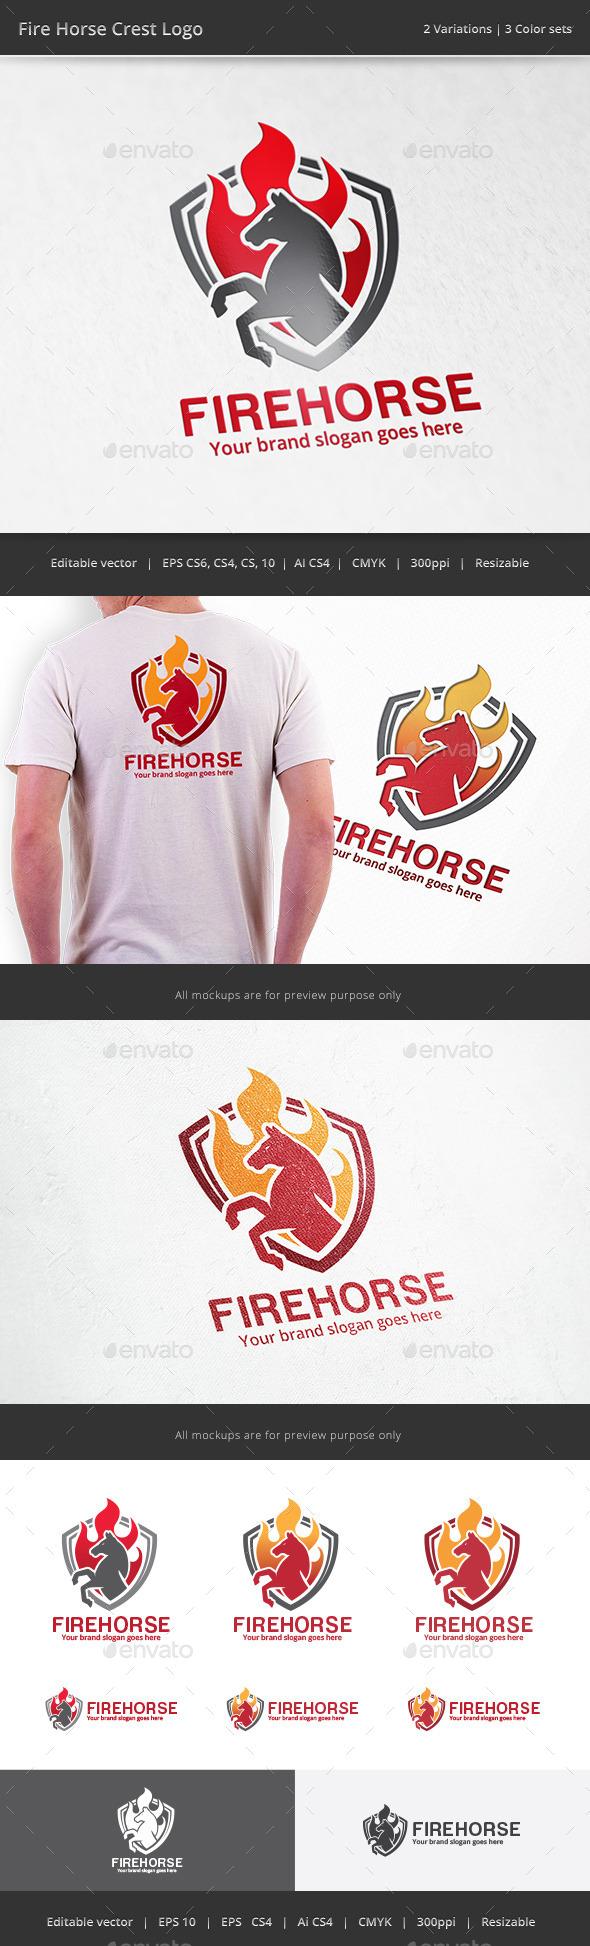 Fire Horse Crest Logo - Crests Logo Templates